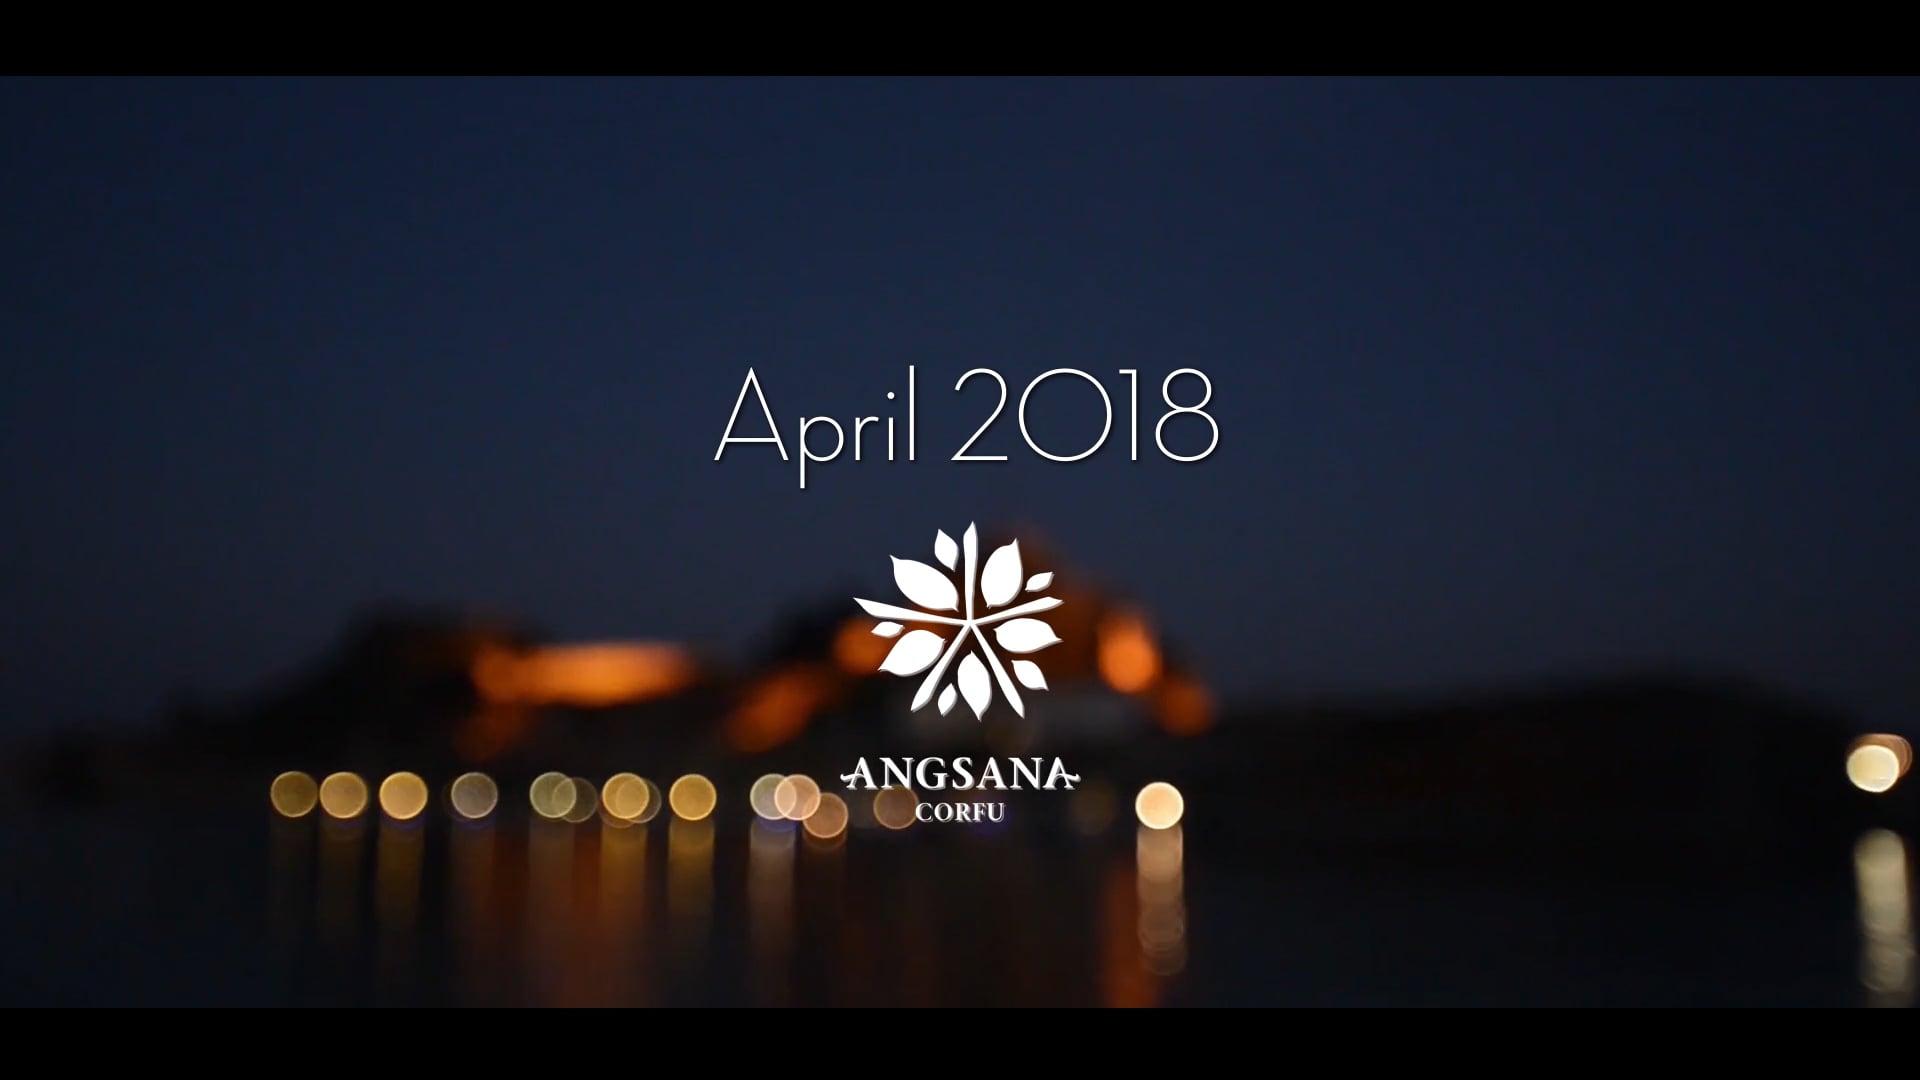 Angsana Hotel Corfu, Greece.